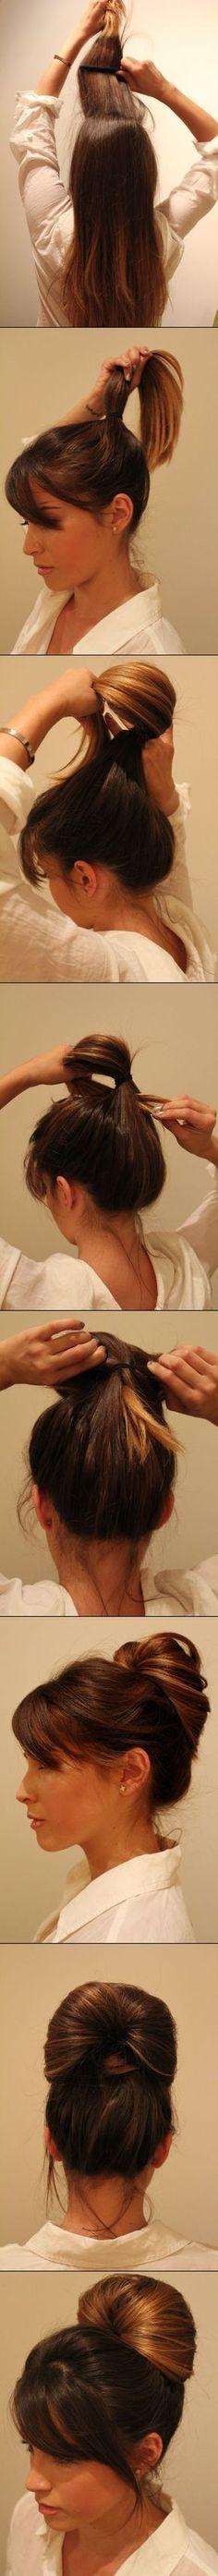 Work Hair - Be Beautiful